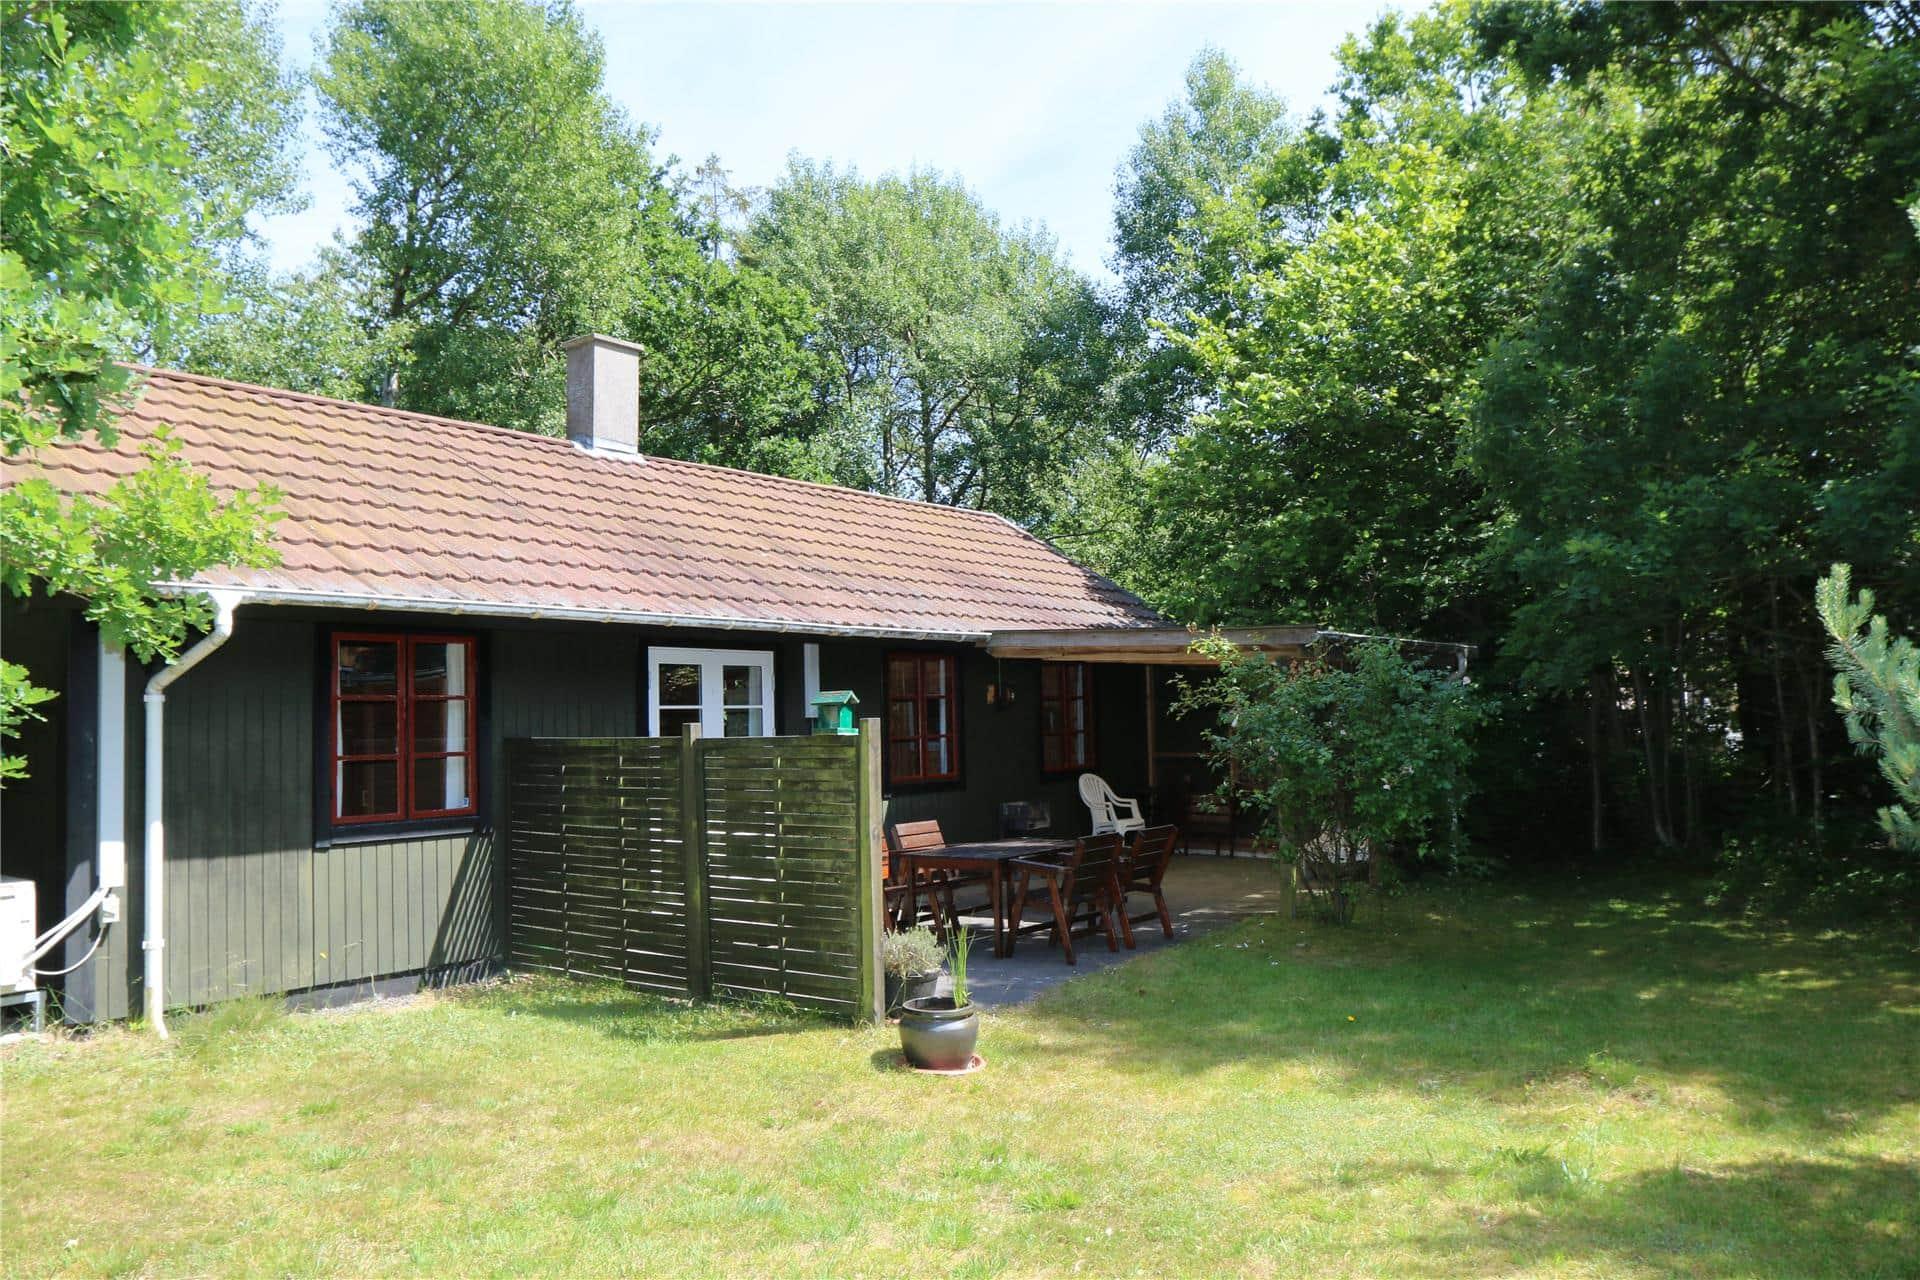 Billede 1-10 Sommerhus 3507, Myrevej 17, DK - 3730 Nexø